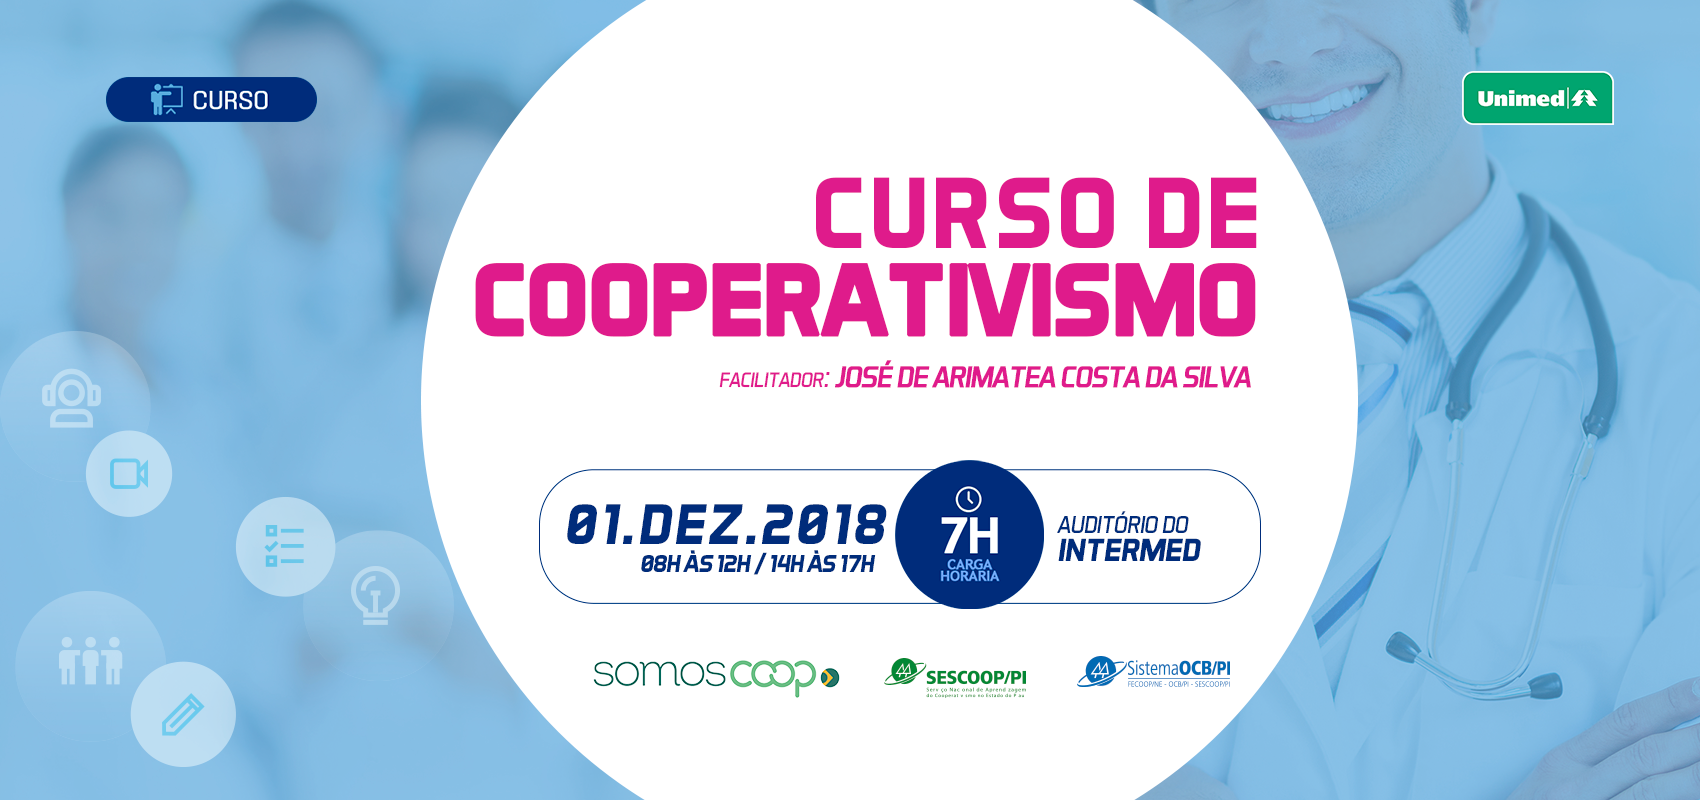 Confira o Jornal Especial sobre o II Encontro das Cooperativas ... 950a7007b0857